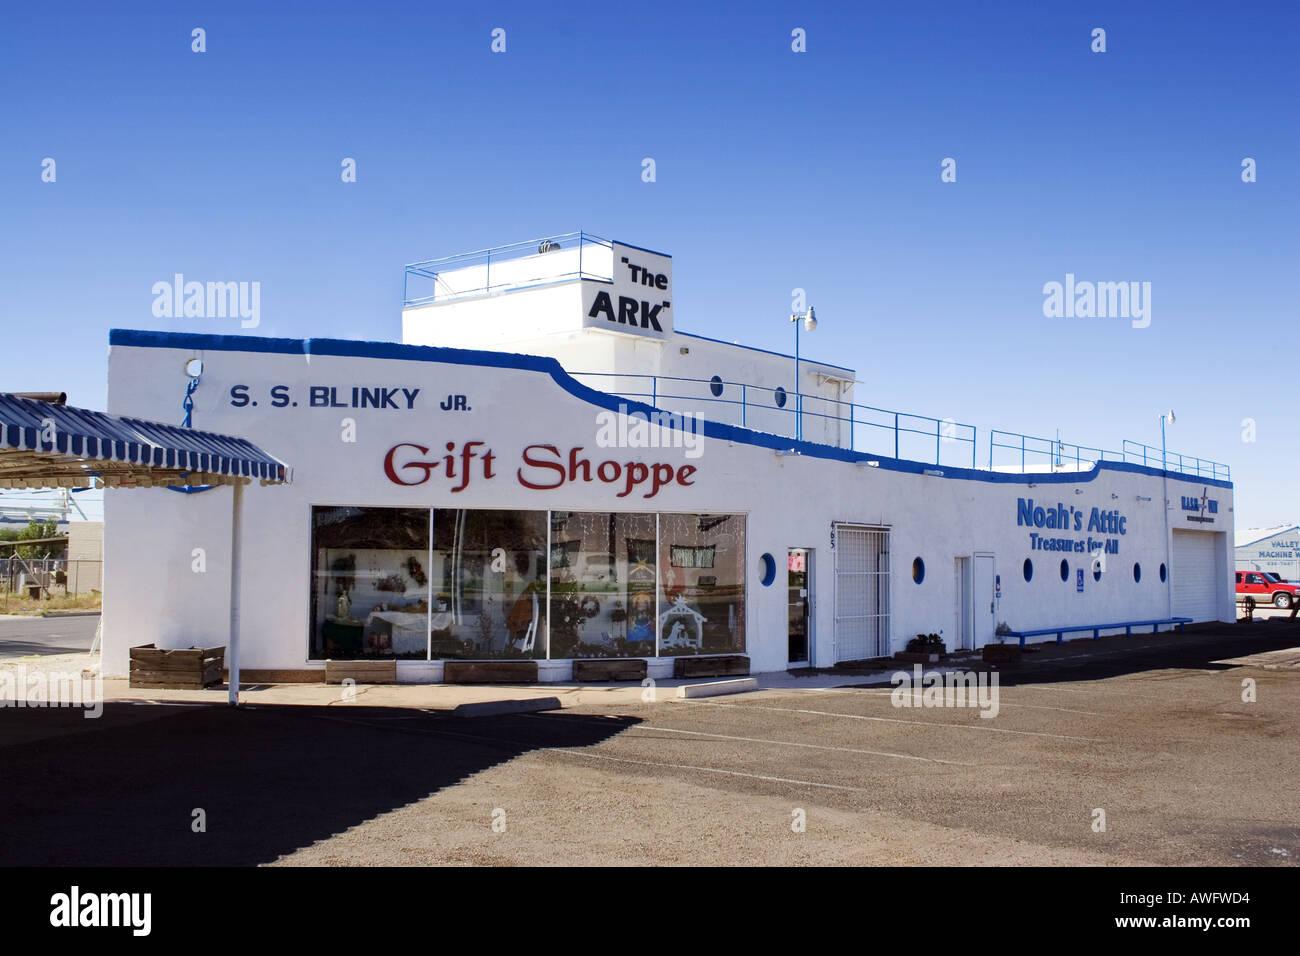 Noahs Attic The Ark gift shop building shaped like a ship in Casa Grandre Arizona - Stock Image